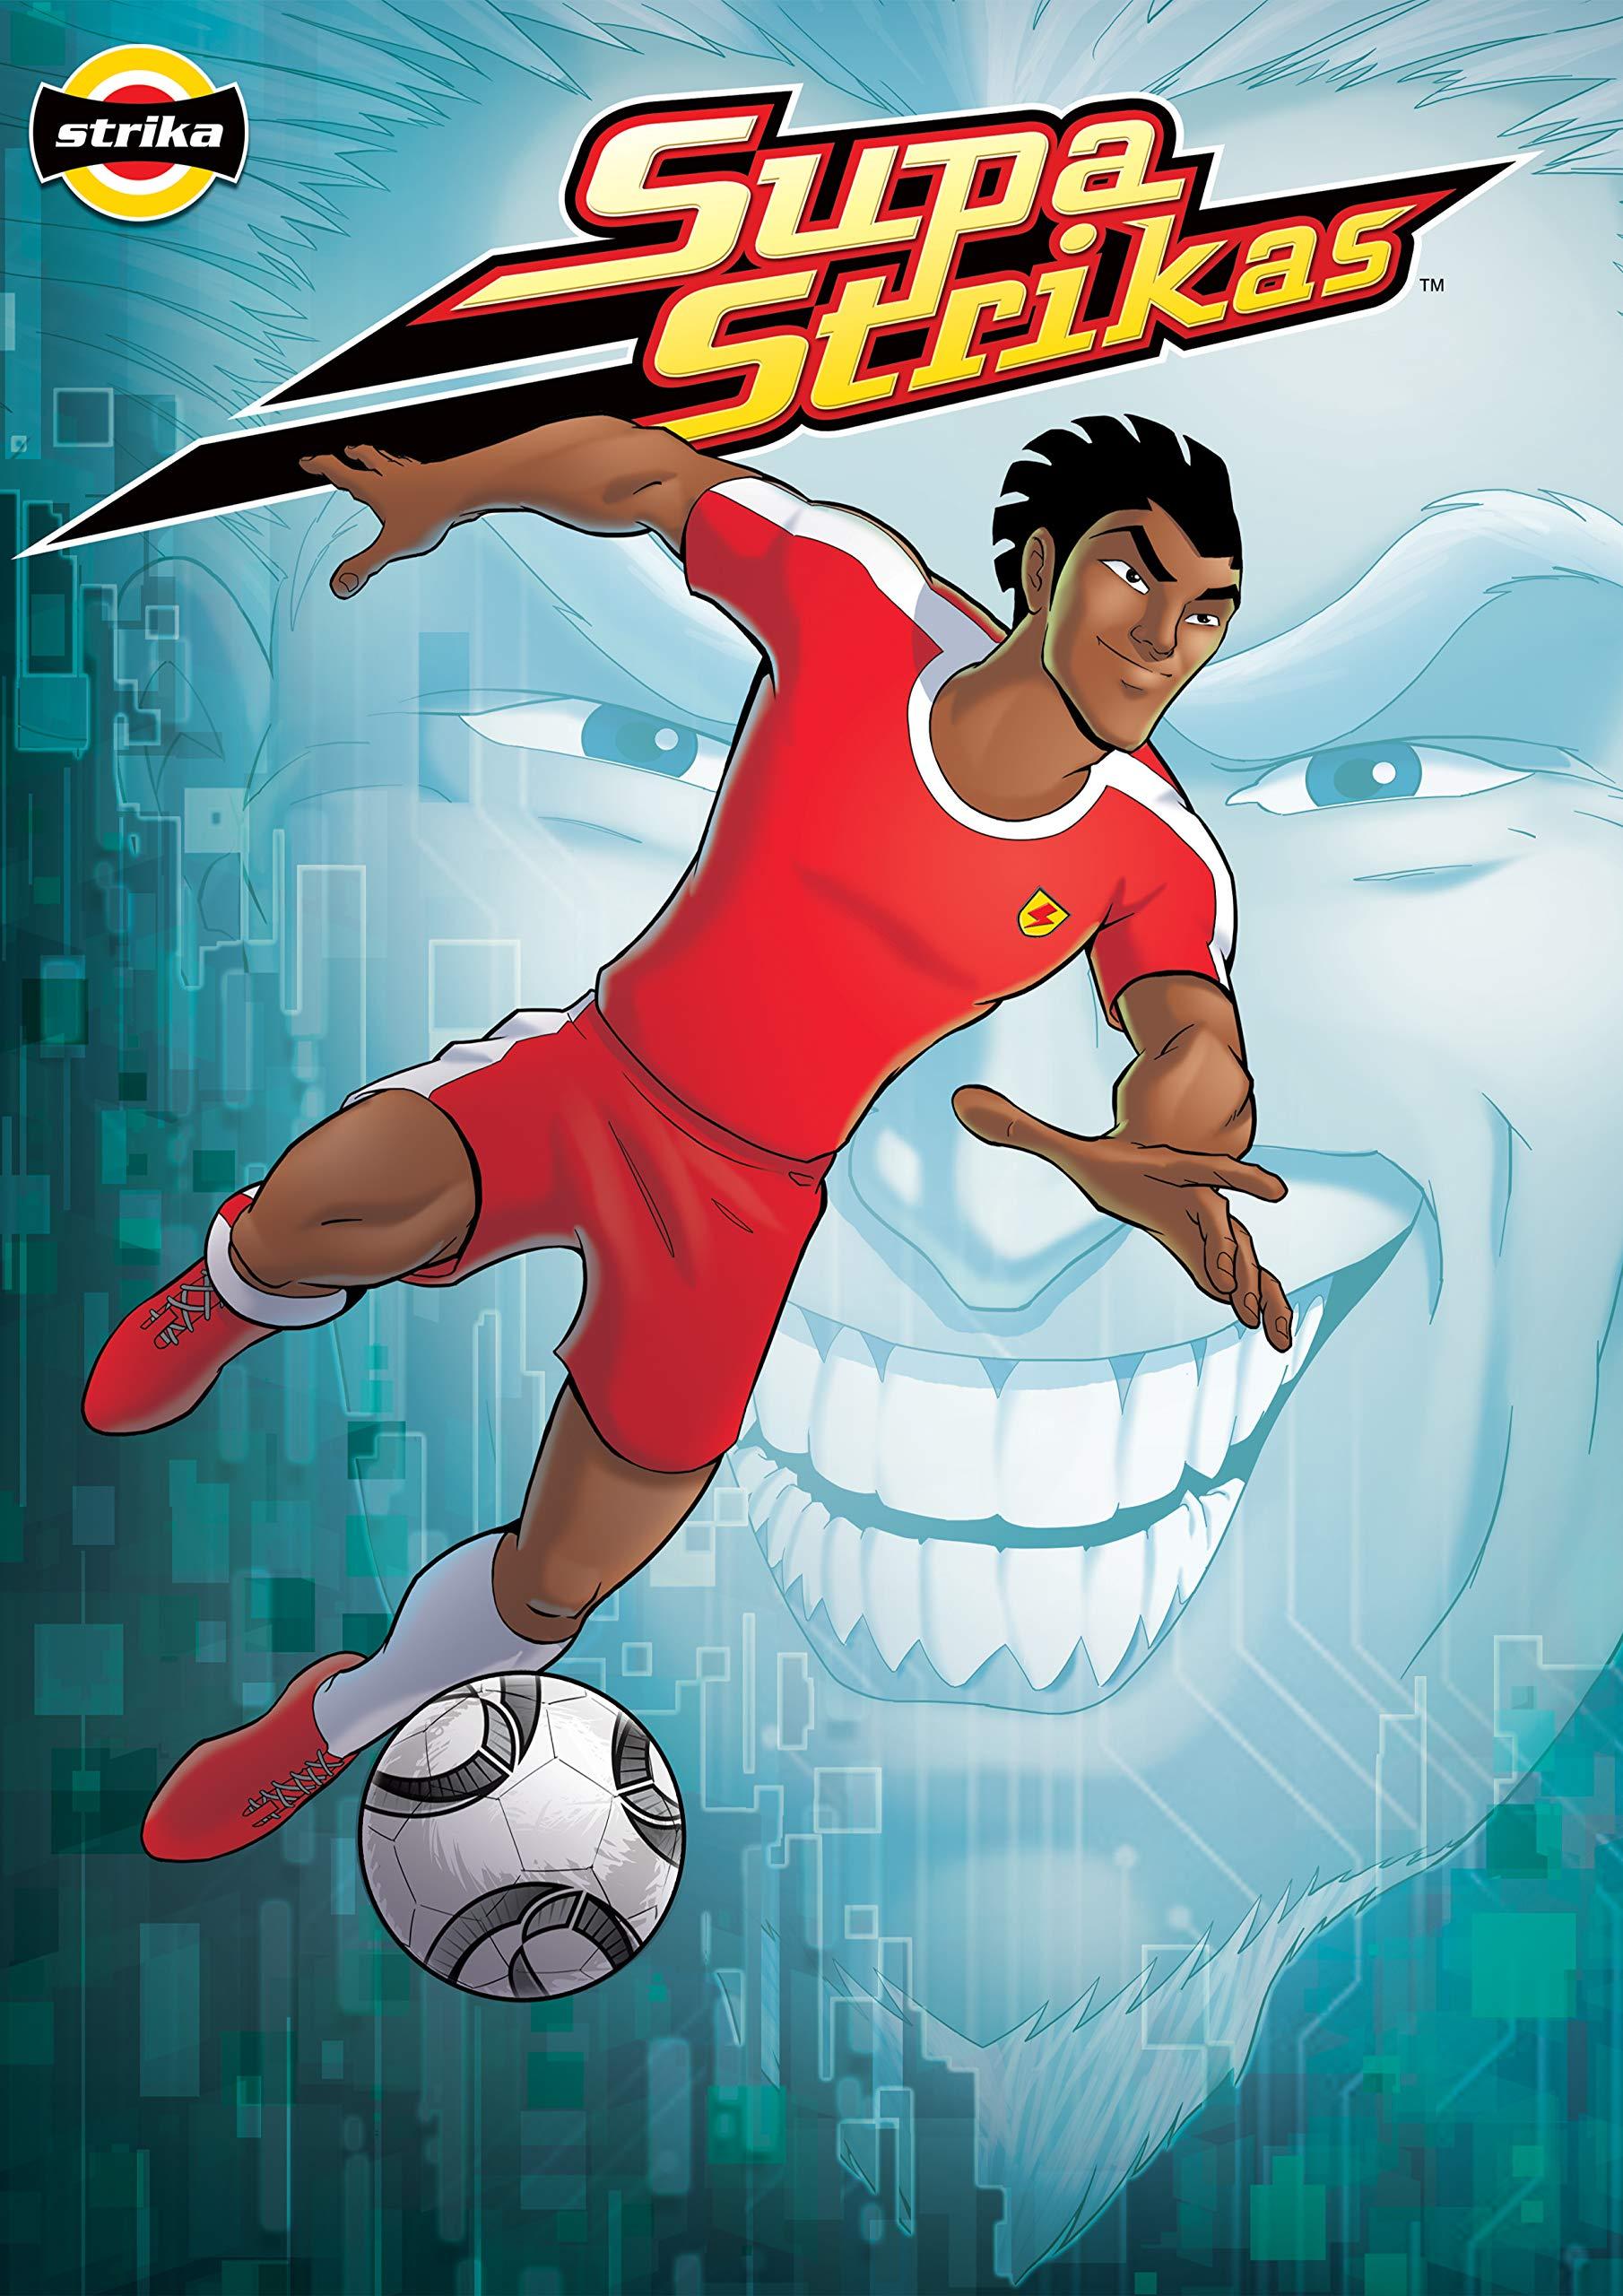 Supa Strikas - Zoning In : Sports Illustrated Kids Graphic Novels - Comics for Children - Soccer Comics for Kids (Super Soccer Book 4)